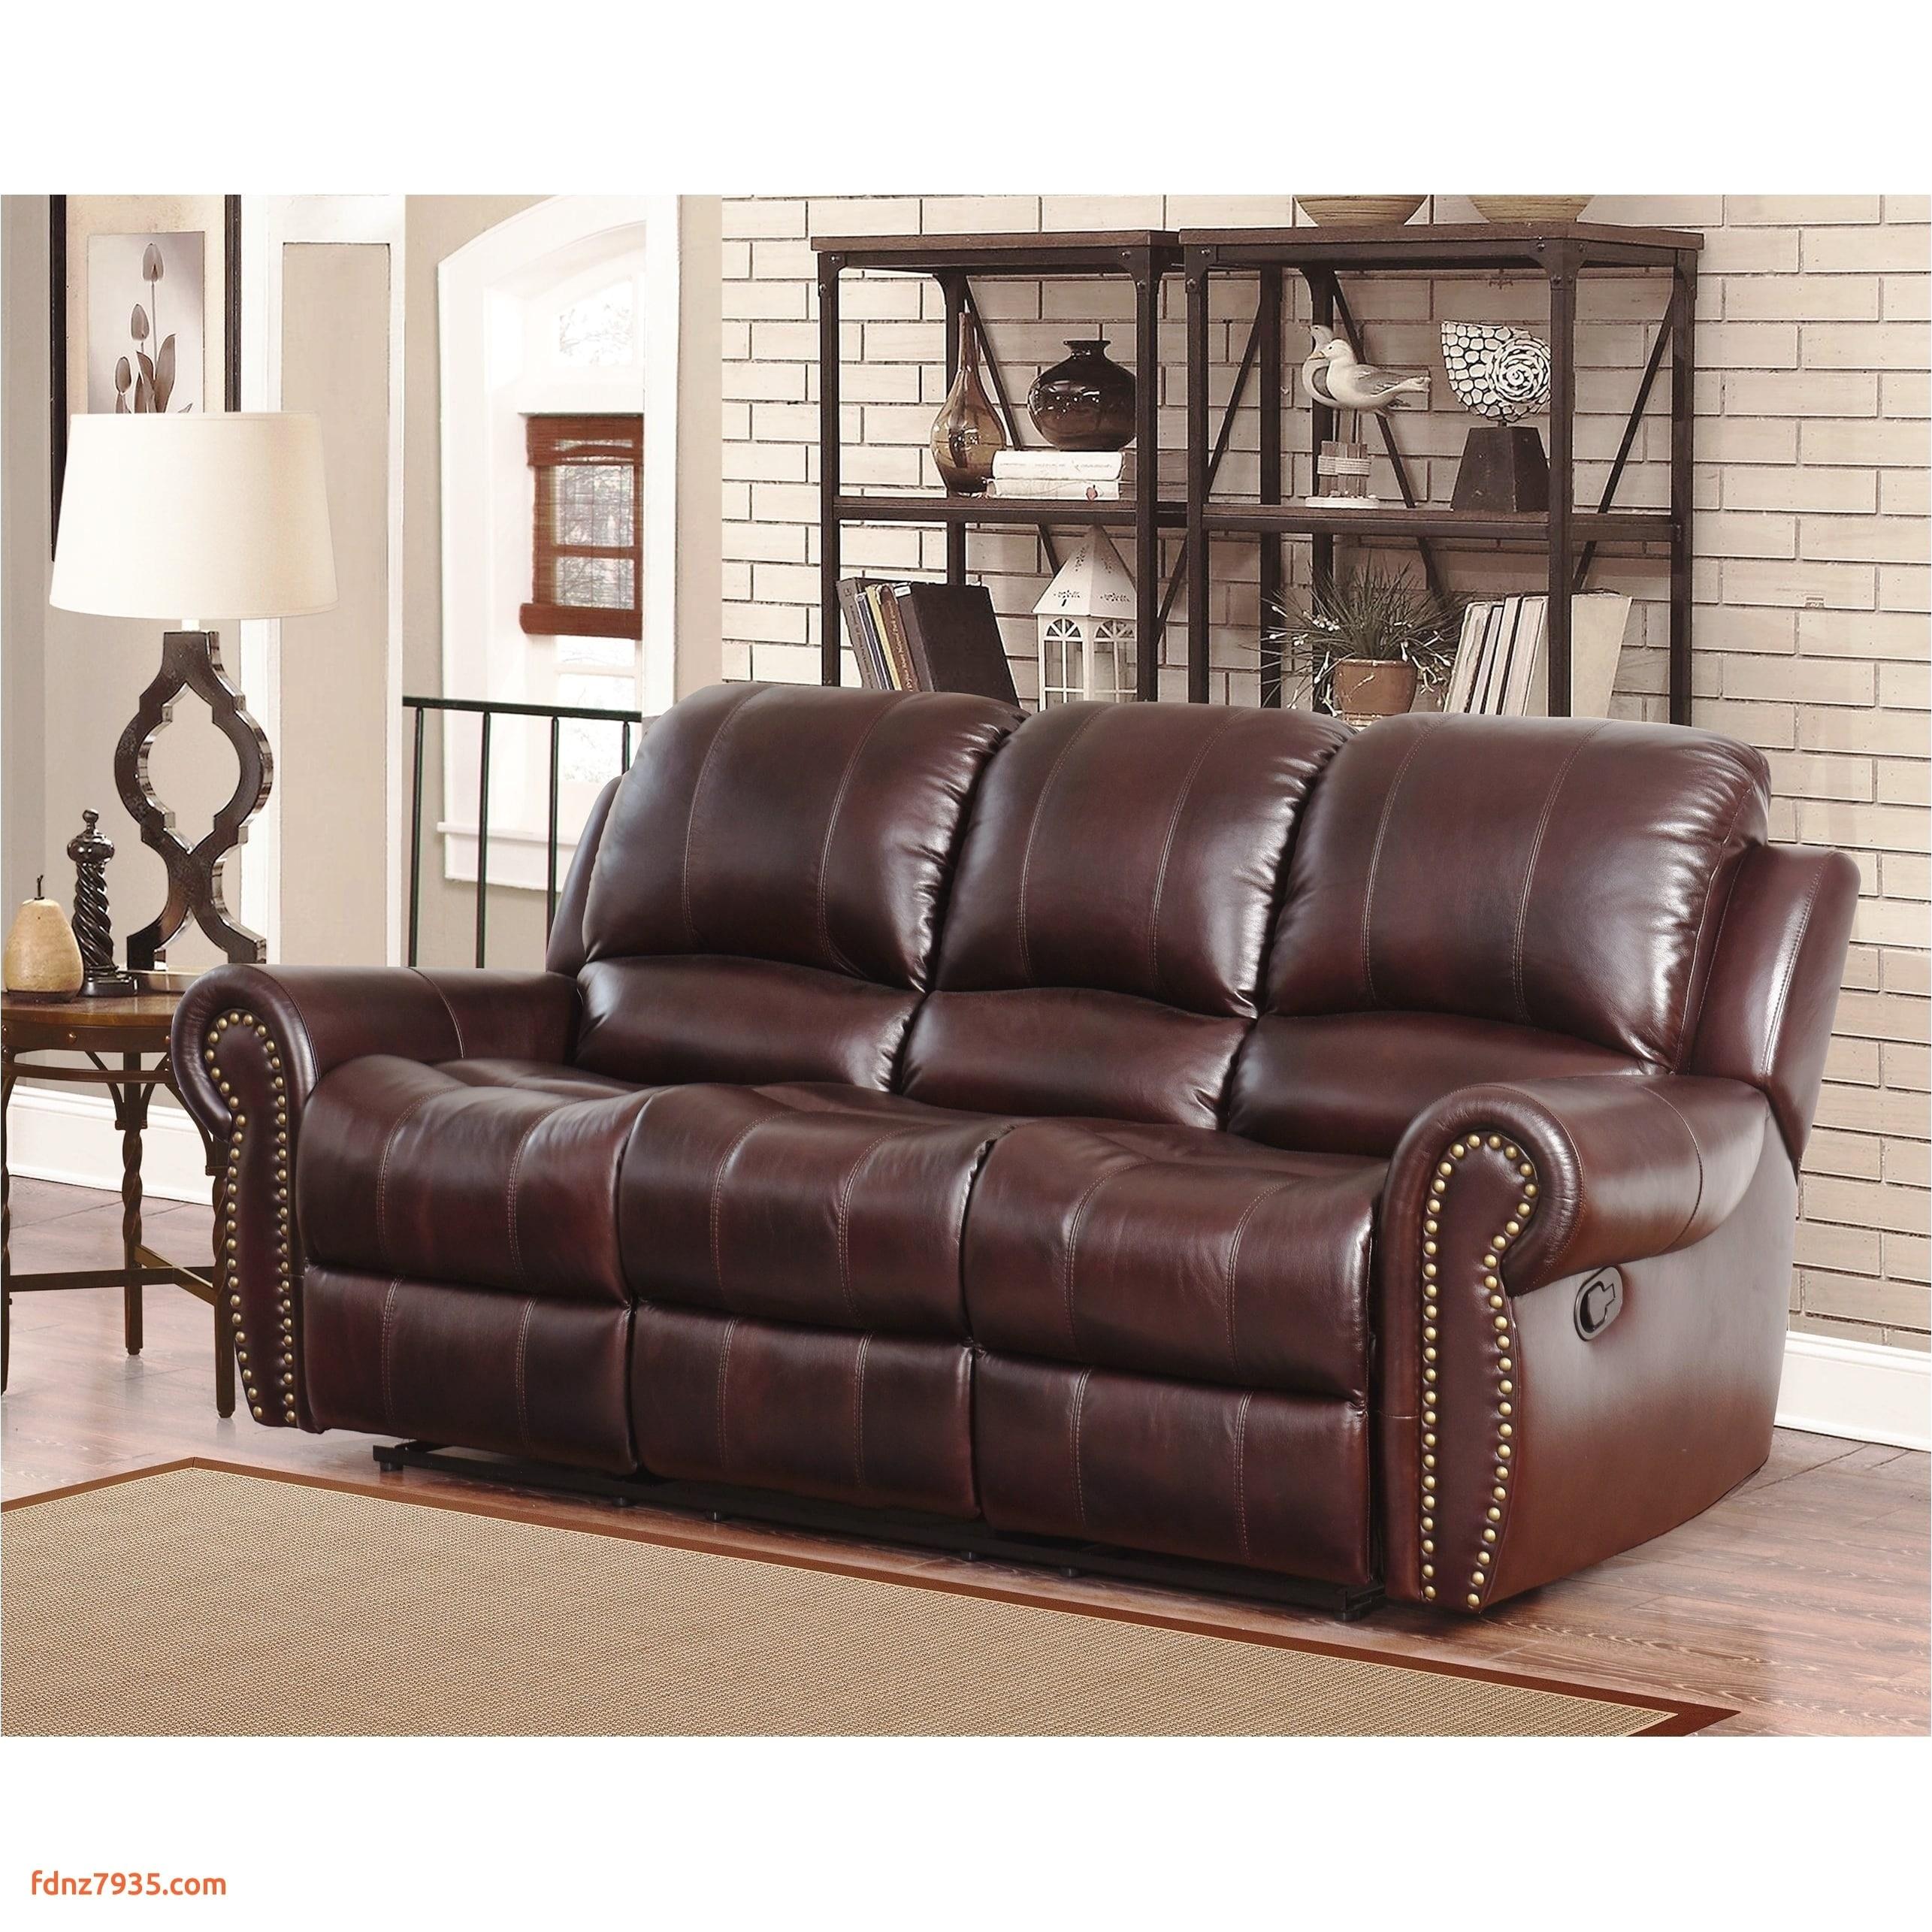 loveseat reclining sofa best patio recliner lounge chair fresh luxuria¶s wicker outdoor sofa 0d